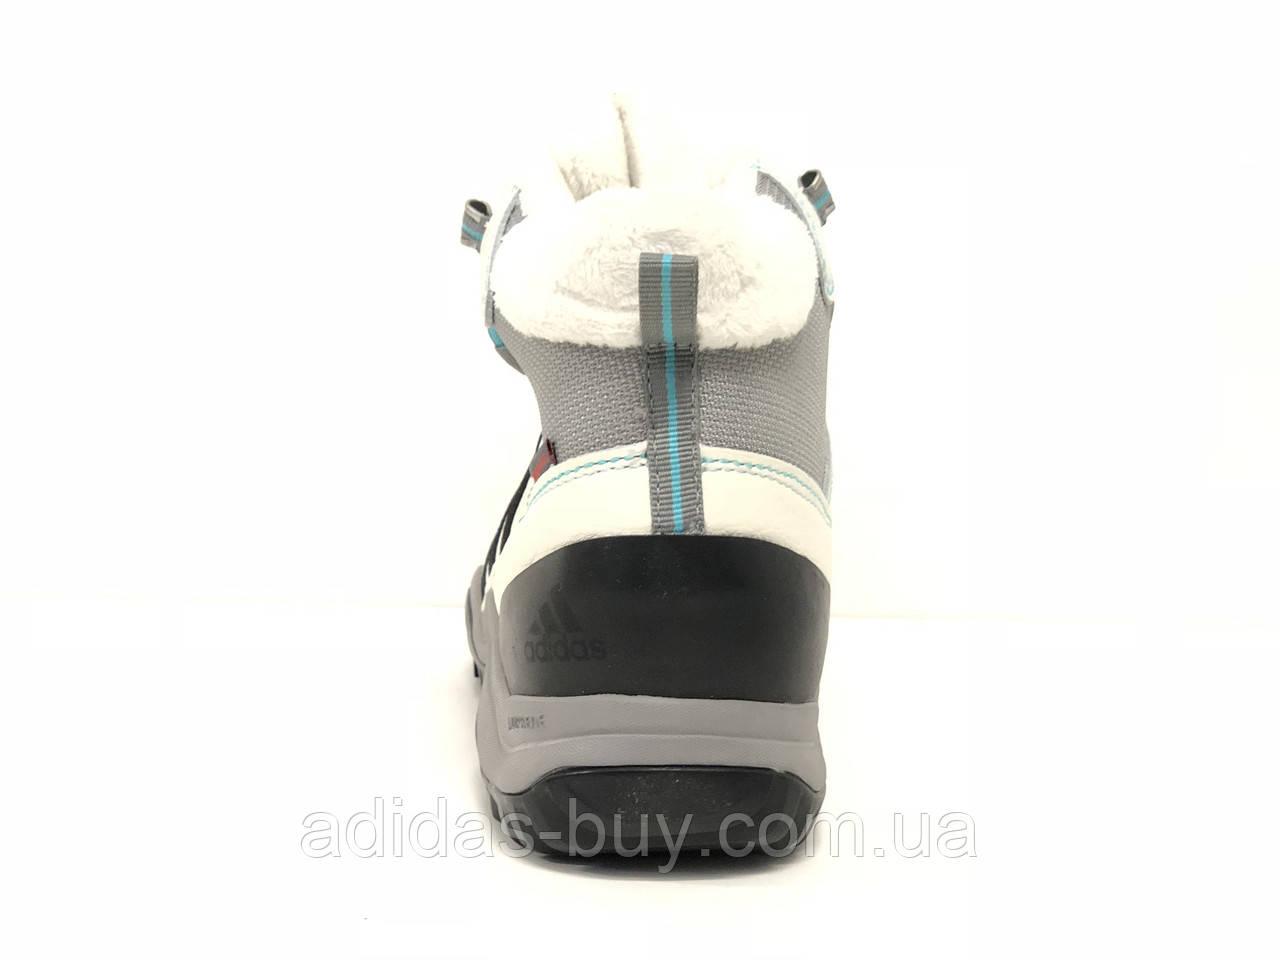 48d0b6ca ... Ботинки женские adidas CLIMAHEAT WINTER HIKER II M17332 цвет: белый 4  ...